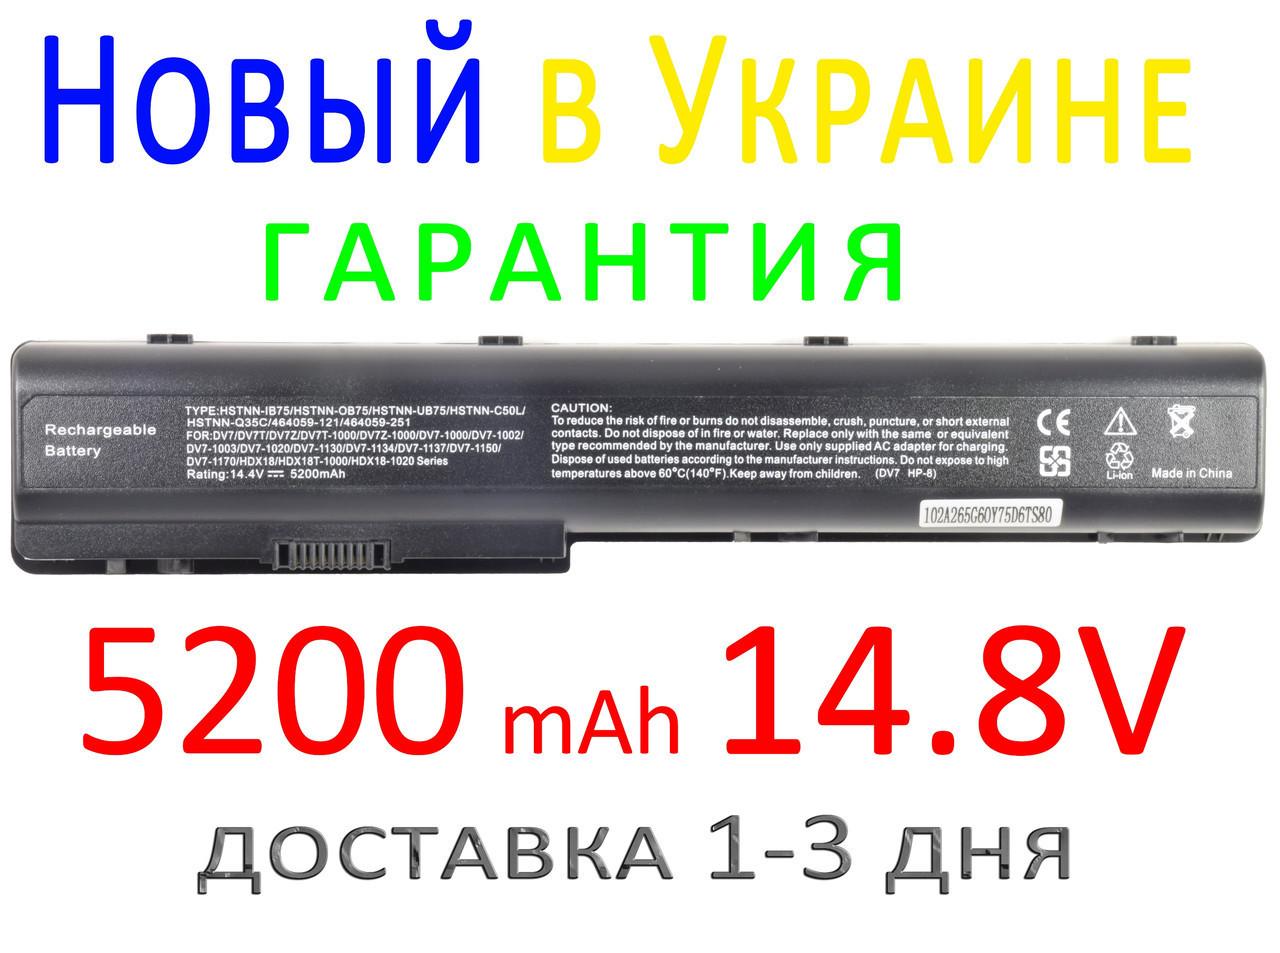 Аккумулятор батарея HSTNN-C50C HSTNN-Q35C HSTNN-Q36C HSTNN-IB97 516478-191 HSTNN-OB75 NBP8A94